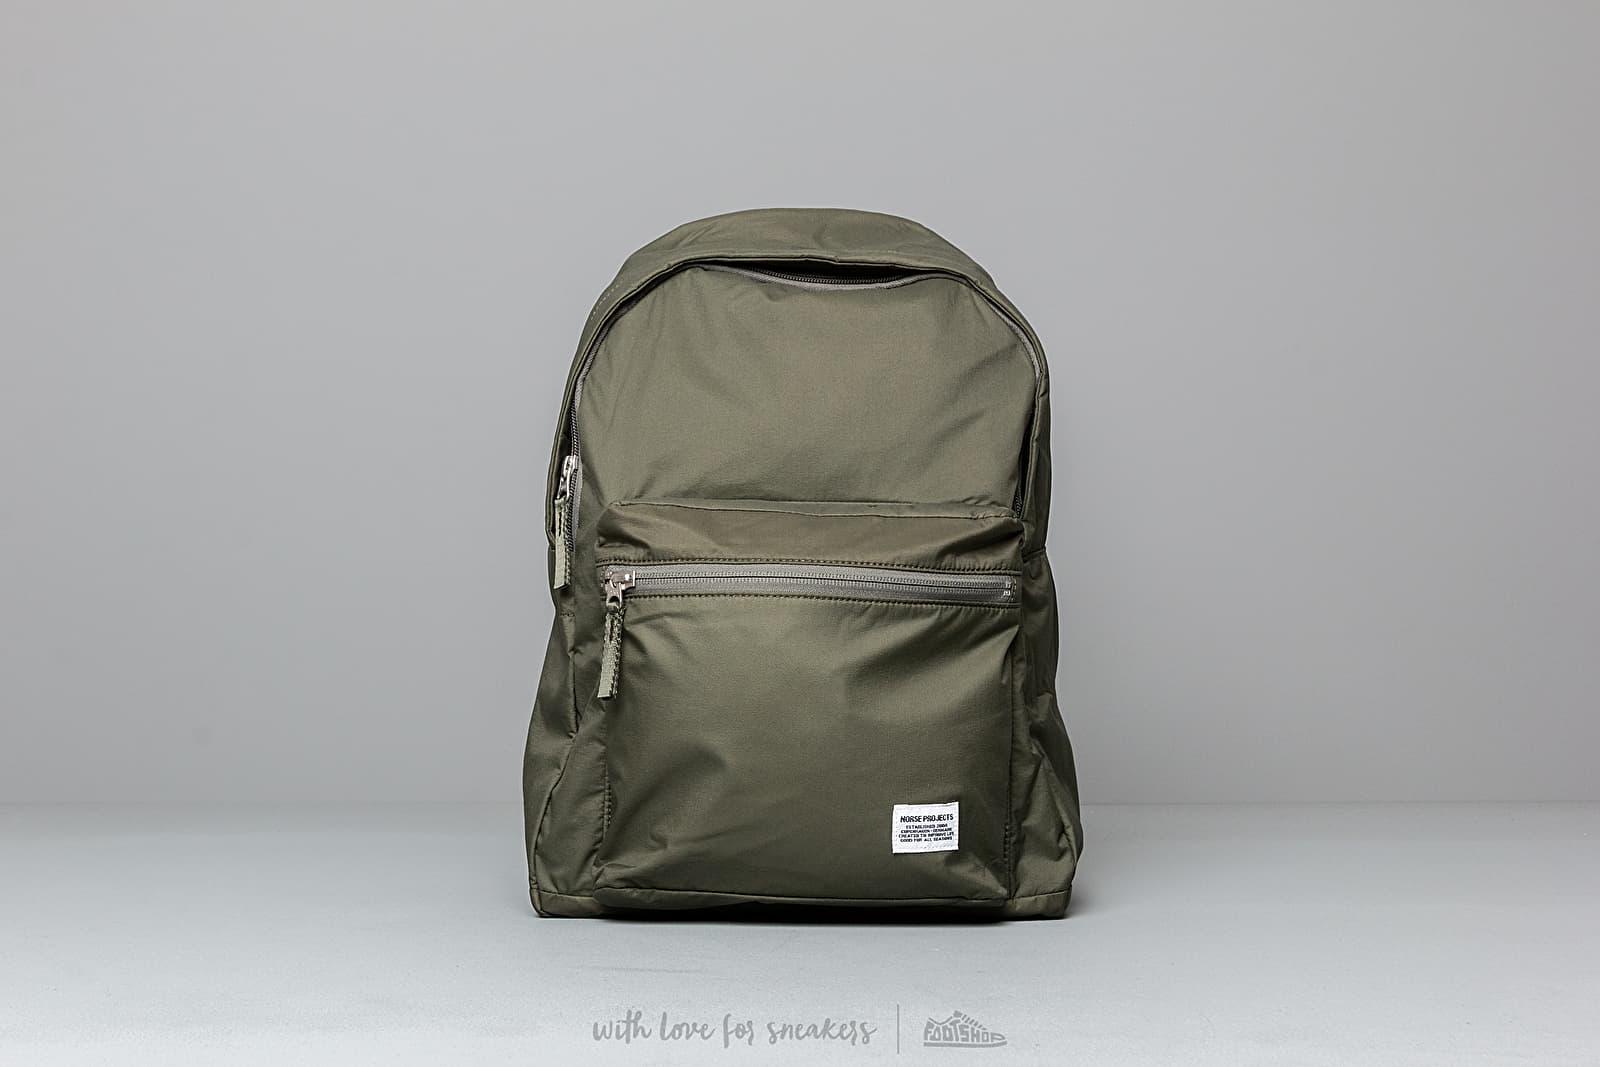 Norse Projects Louie Ripstop Backpack Dried Olive za skvelú cenu 103 € kúpite na Footshop.sk